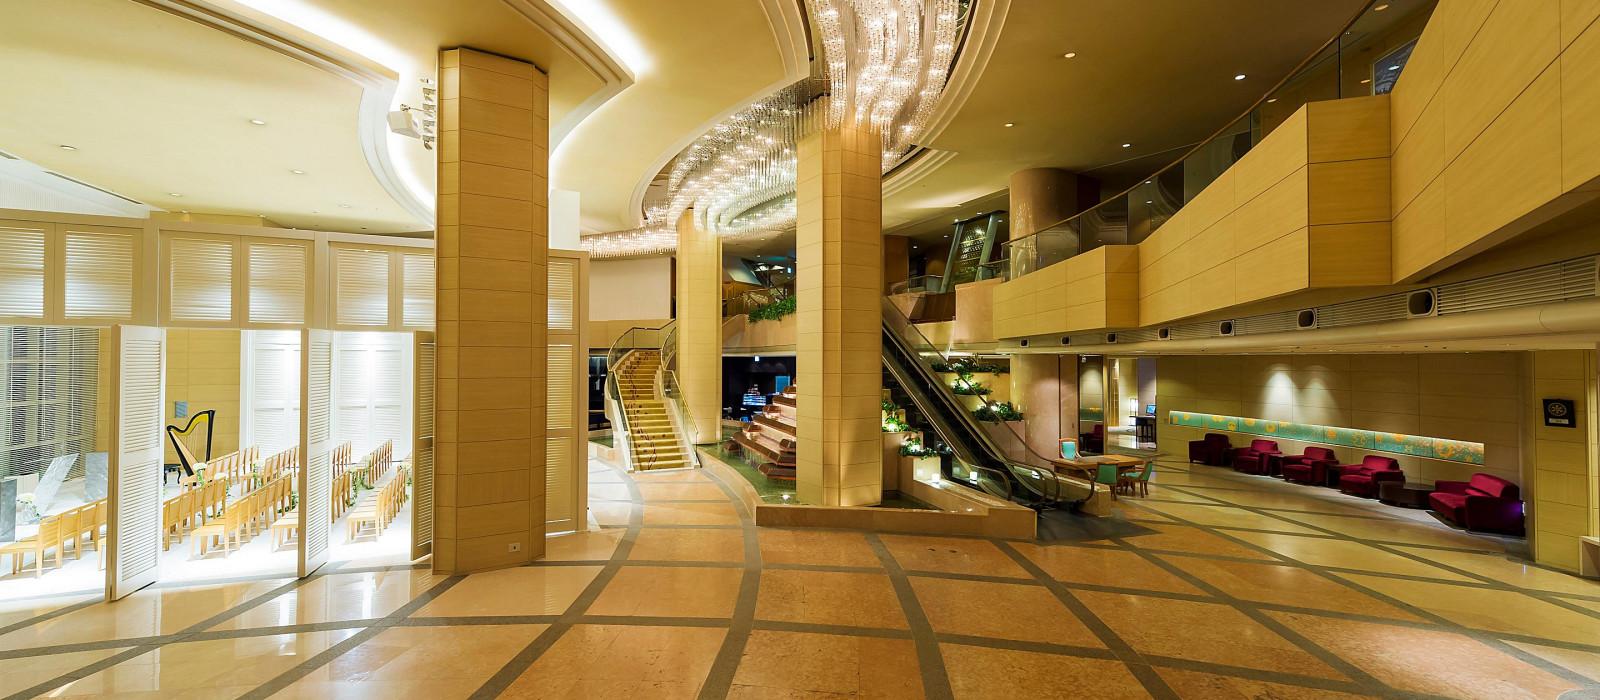 Hotel ANA Crowne Plaza Kanazawa Japan